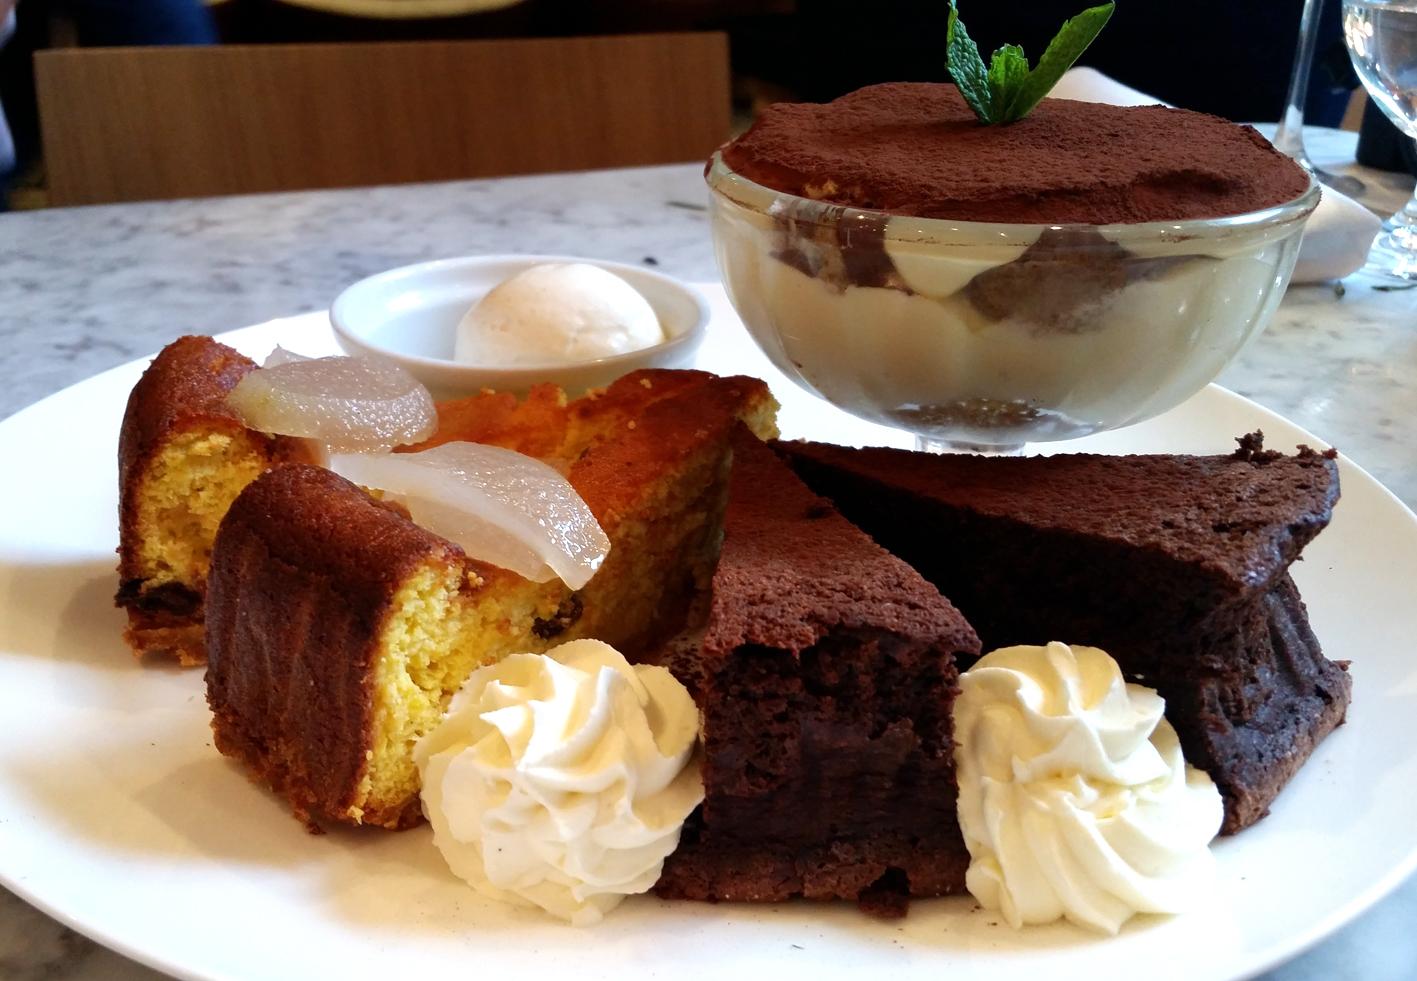 Theo's Simple Italian dessert